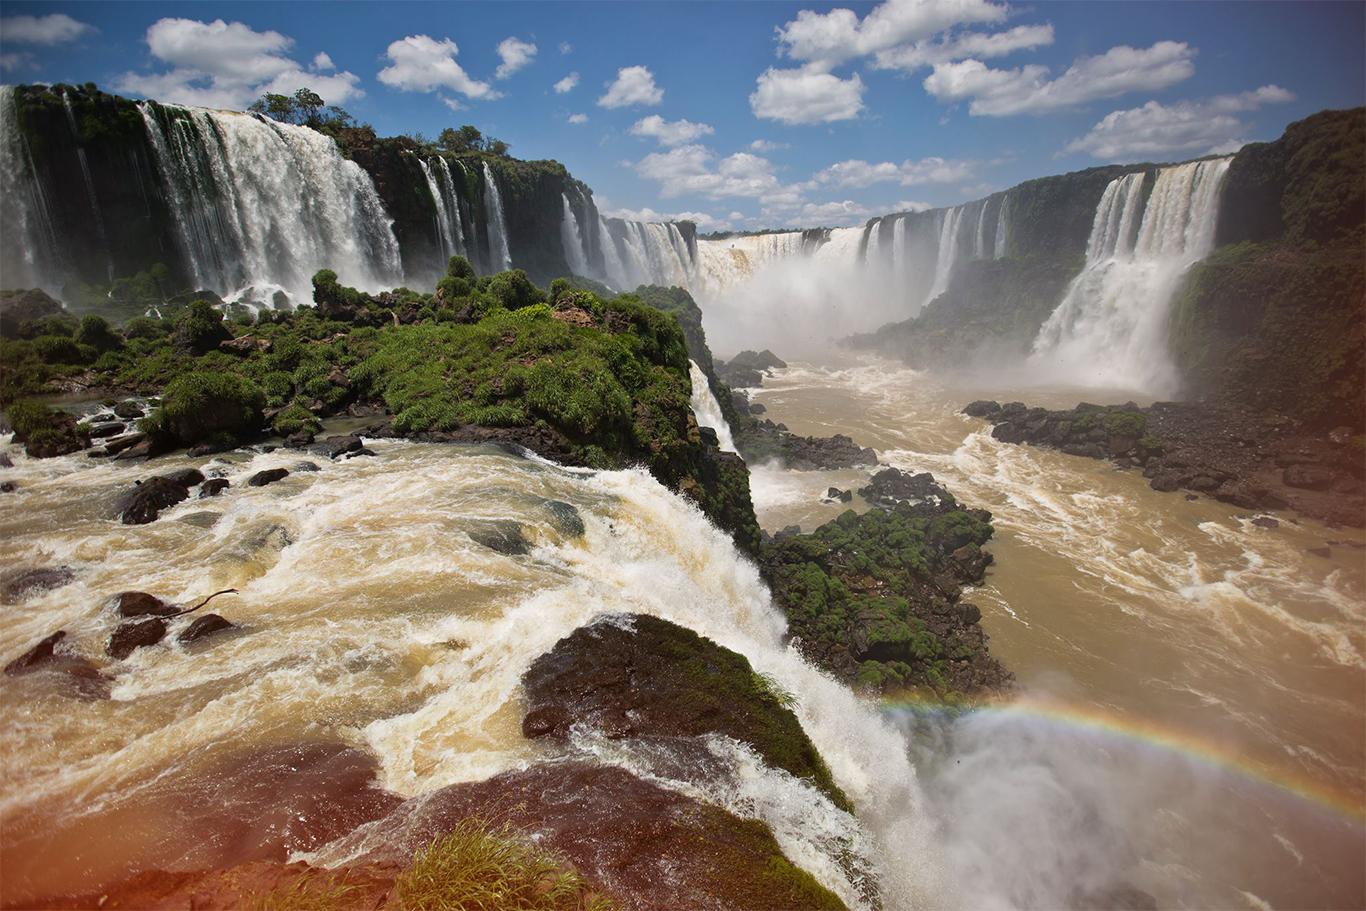 Wodospady Iguassu